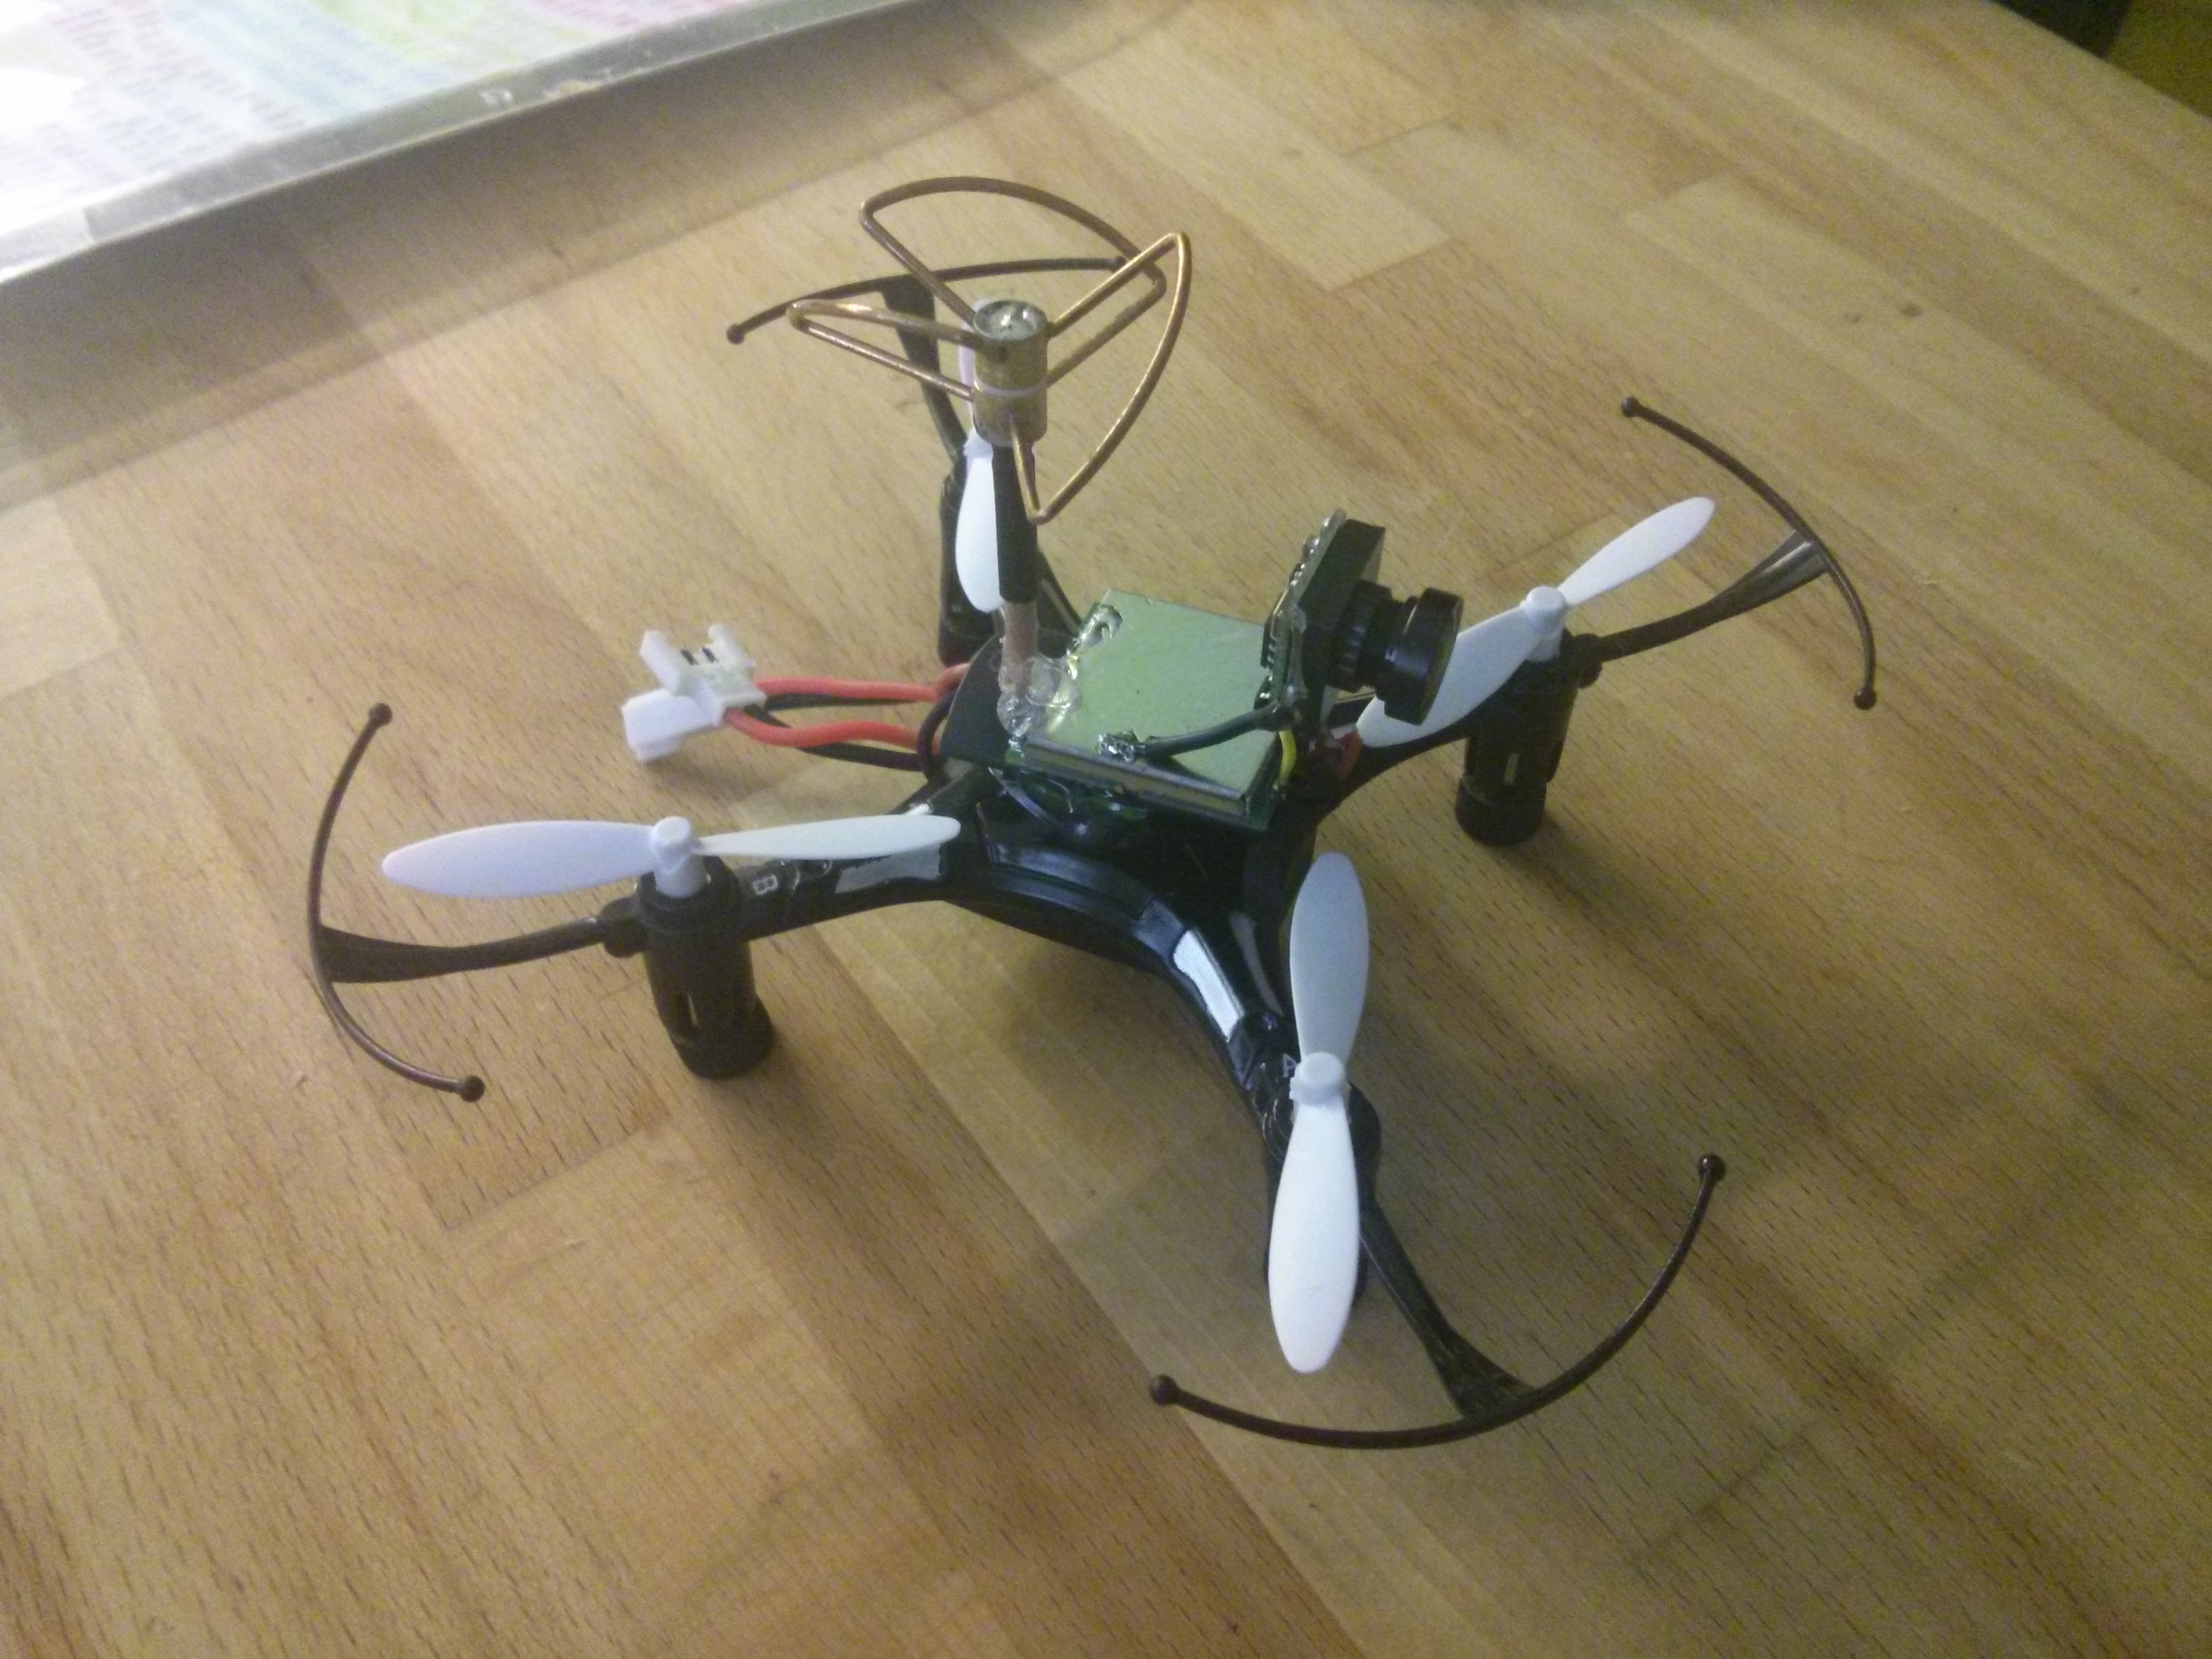 Diy Micro Fpv Quadcopter Hobbyking Wiring Diagram Img 20151225 125621